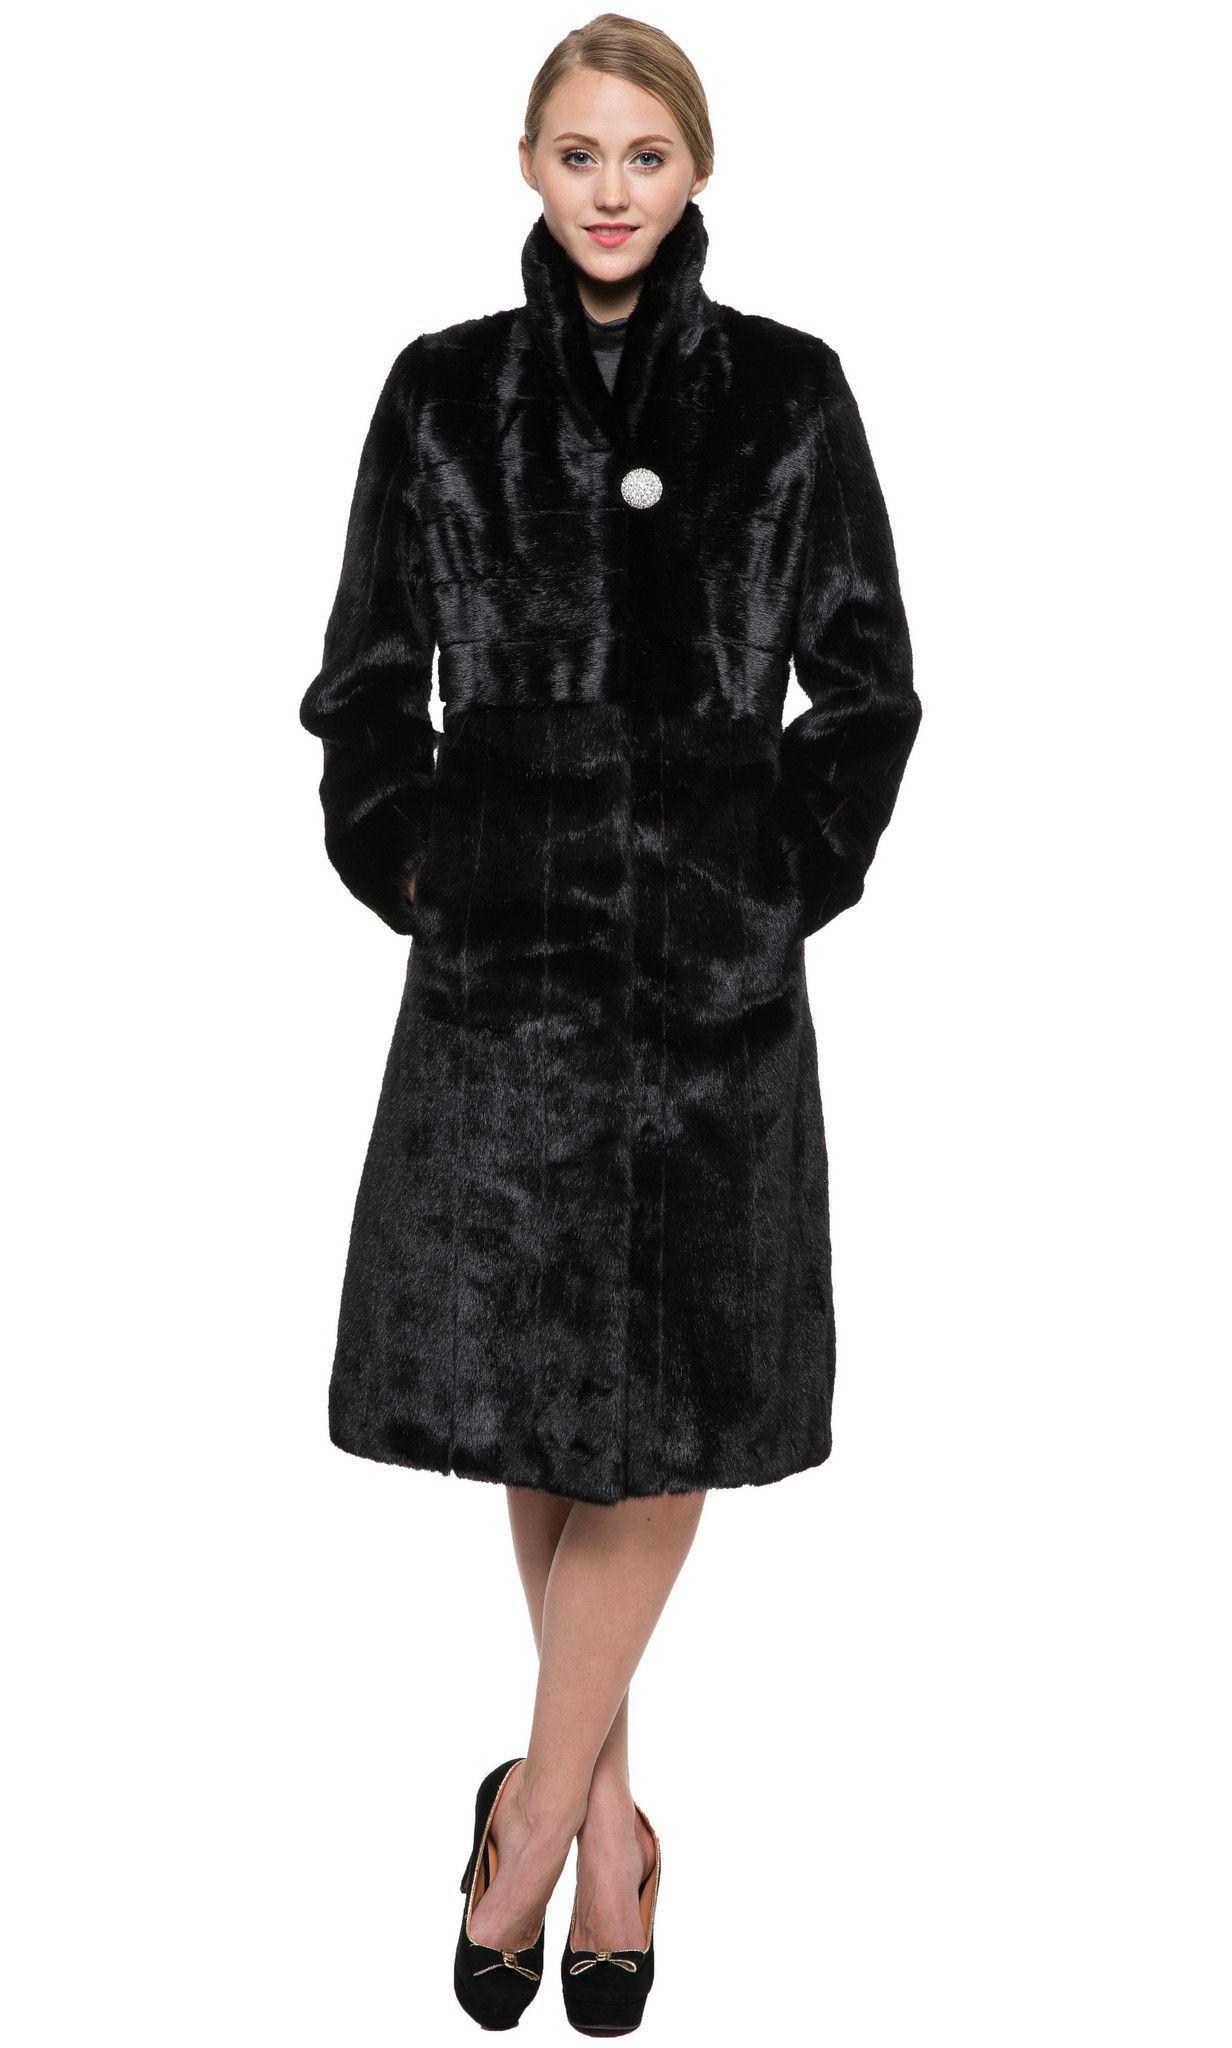 Clearance! Eternity Black Mink Faux Fur Coat Design By Italy   Fur ...